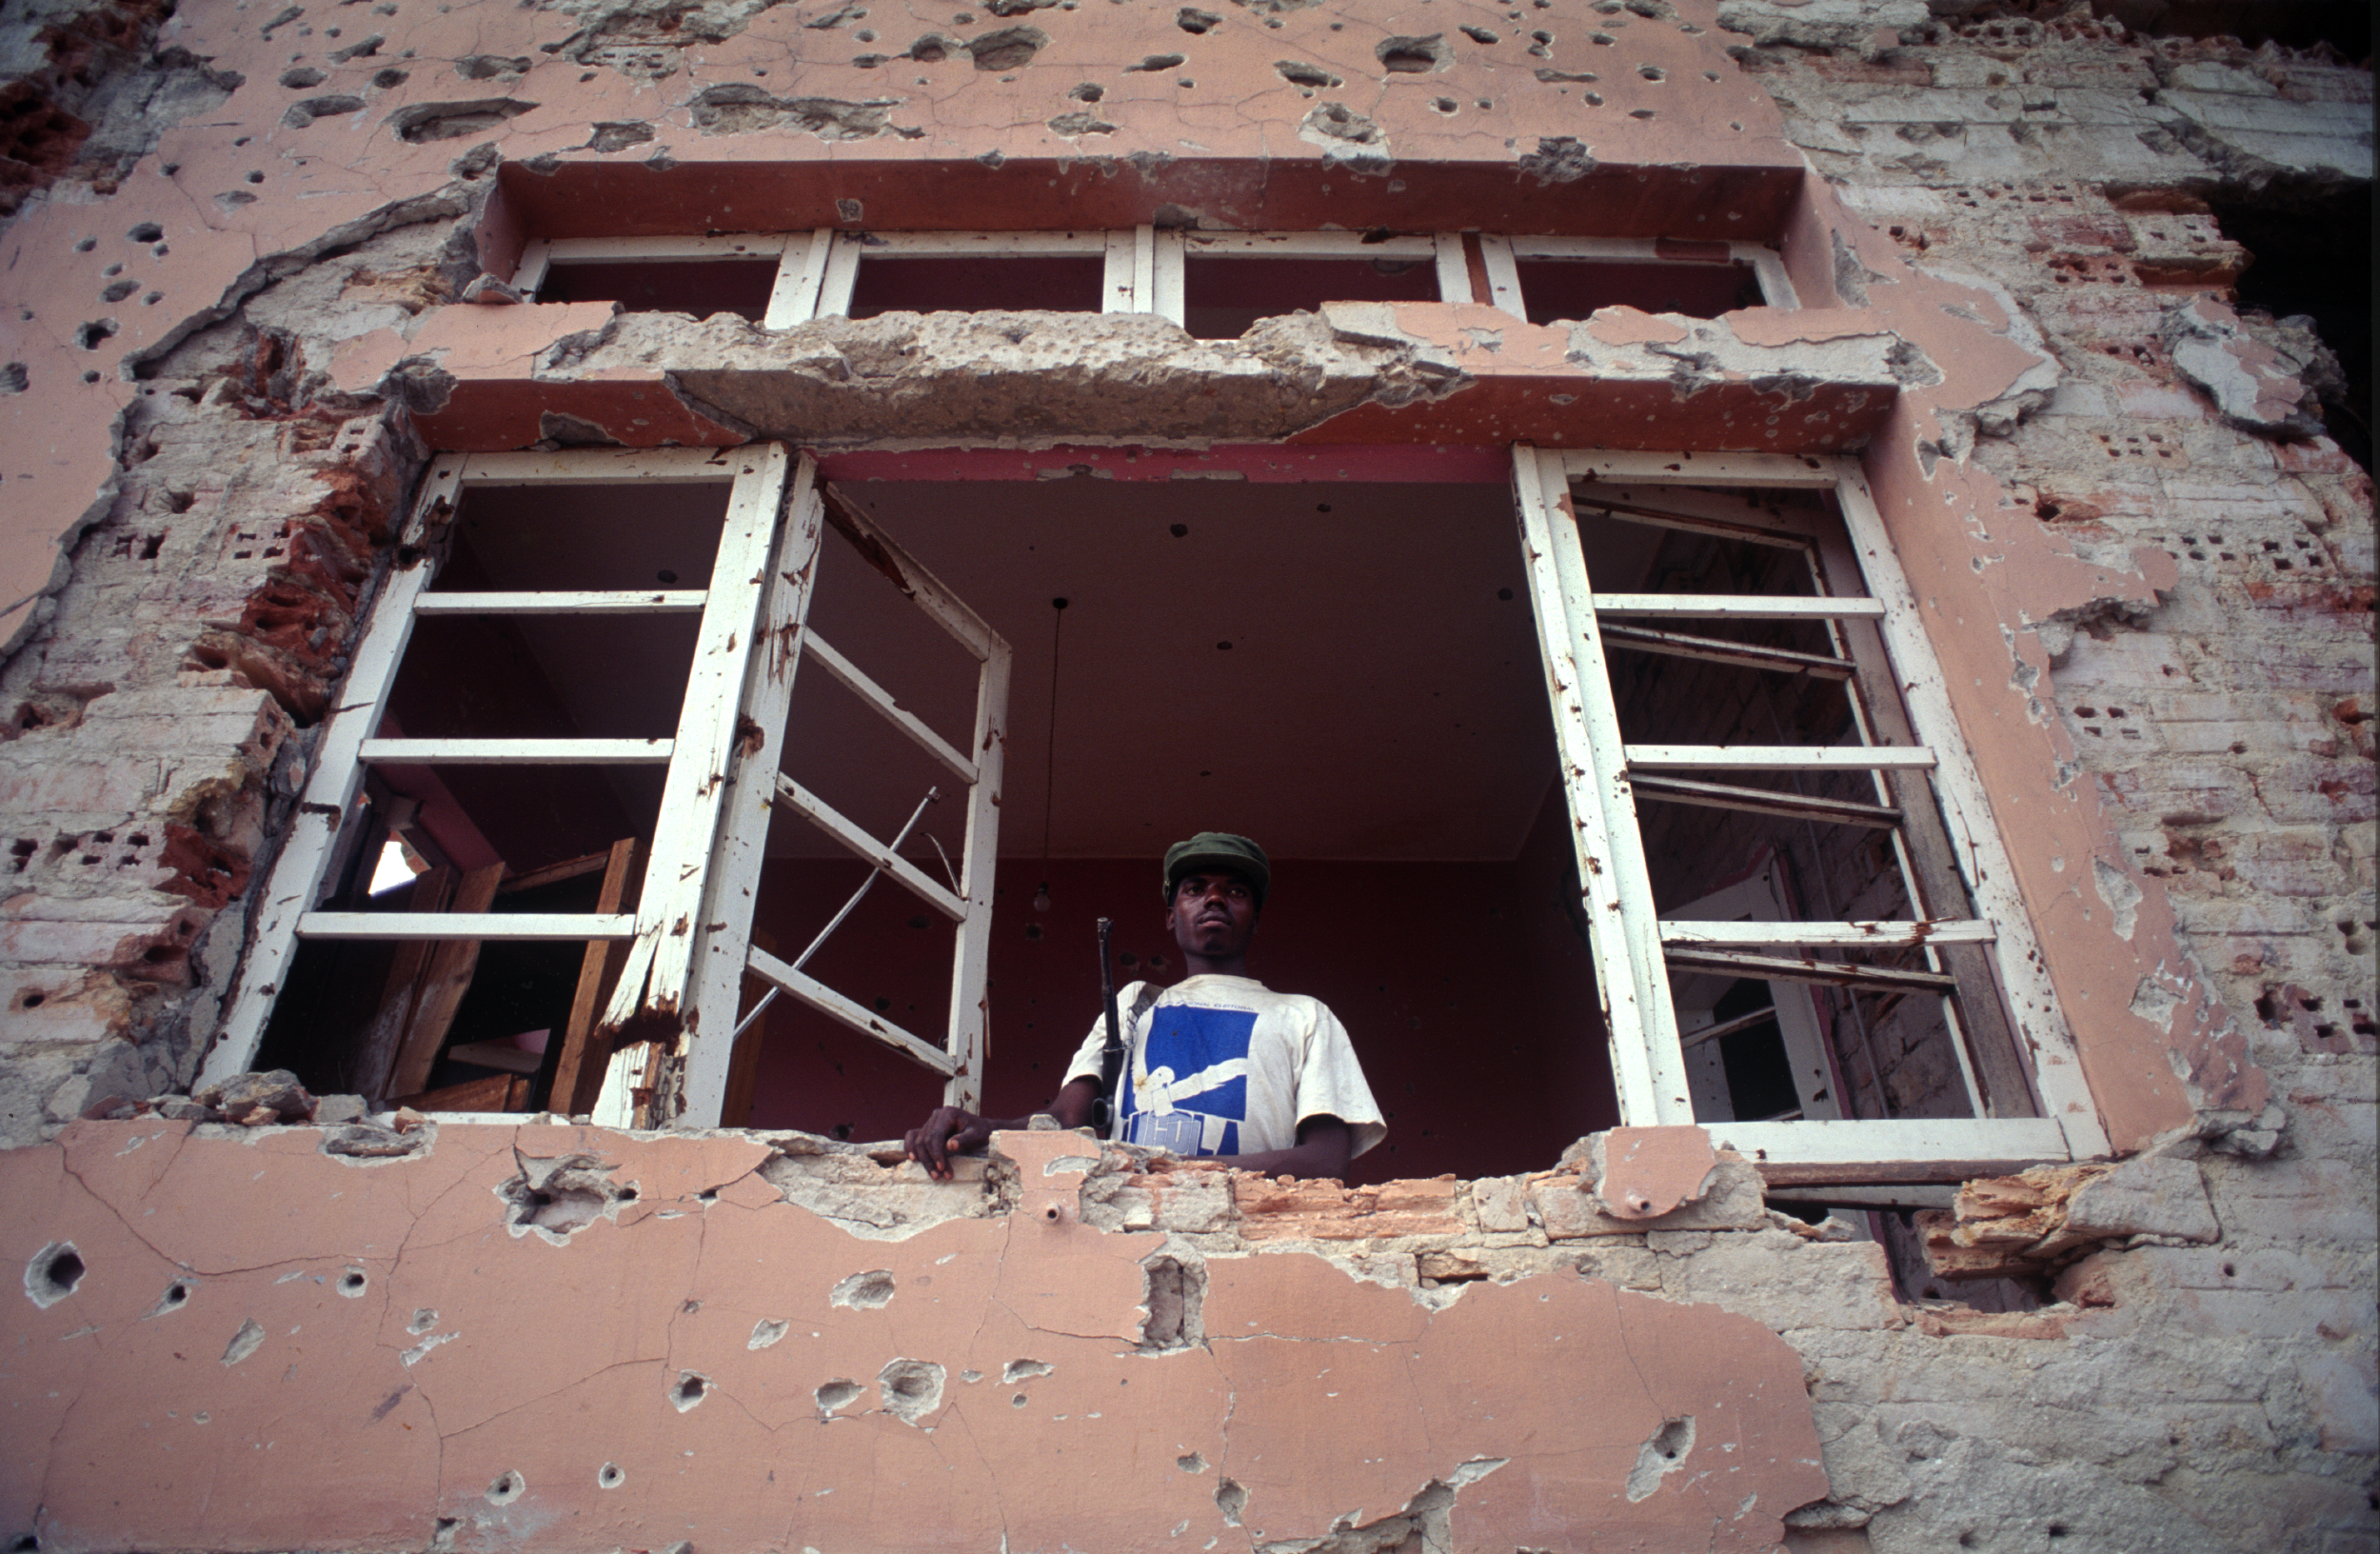 """Ceasefire"" during Angola's destructive civil war. Quito, Angola, 1993"